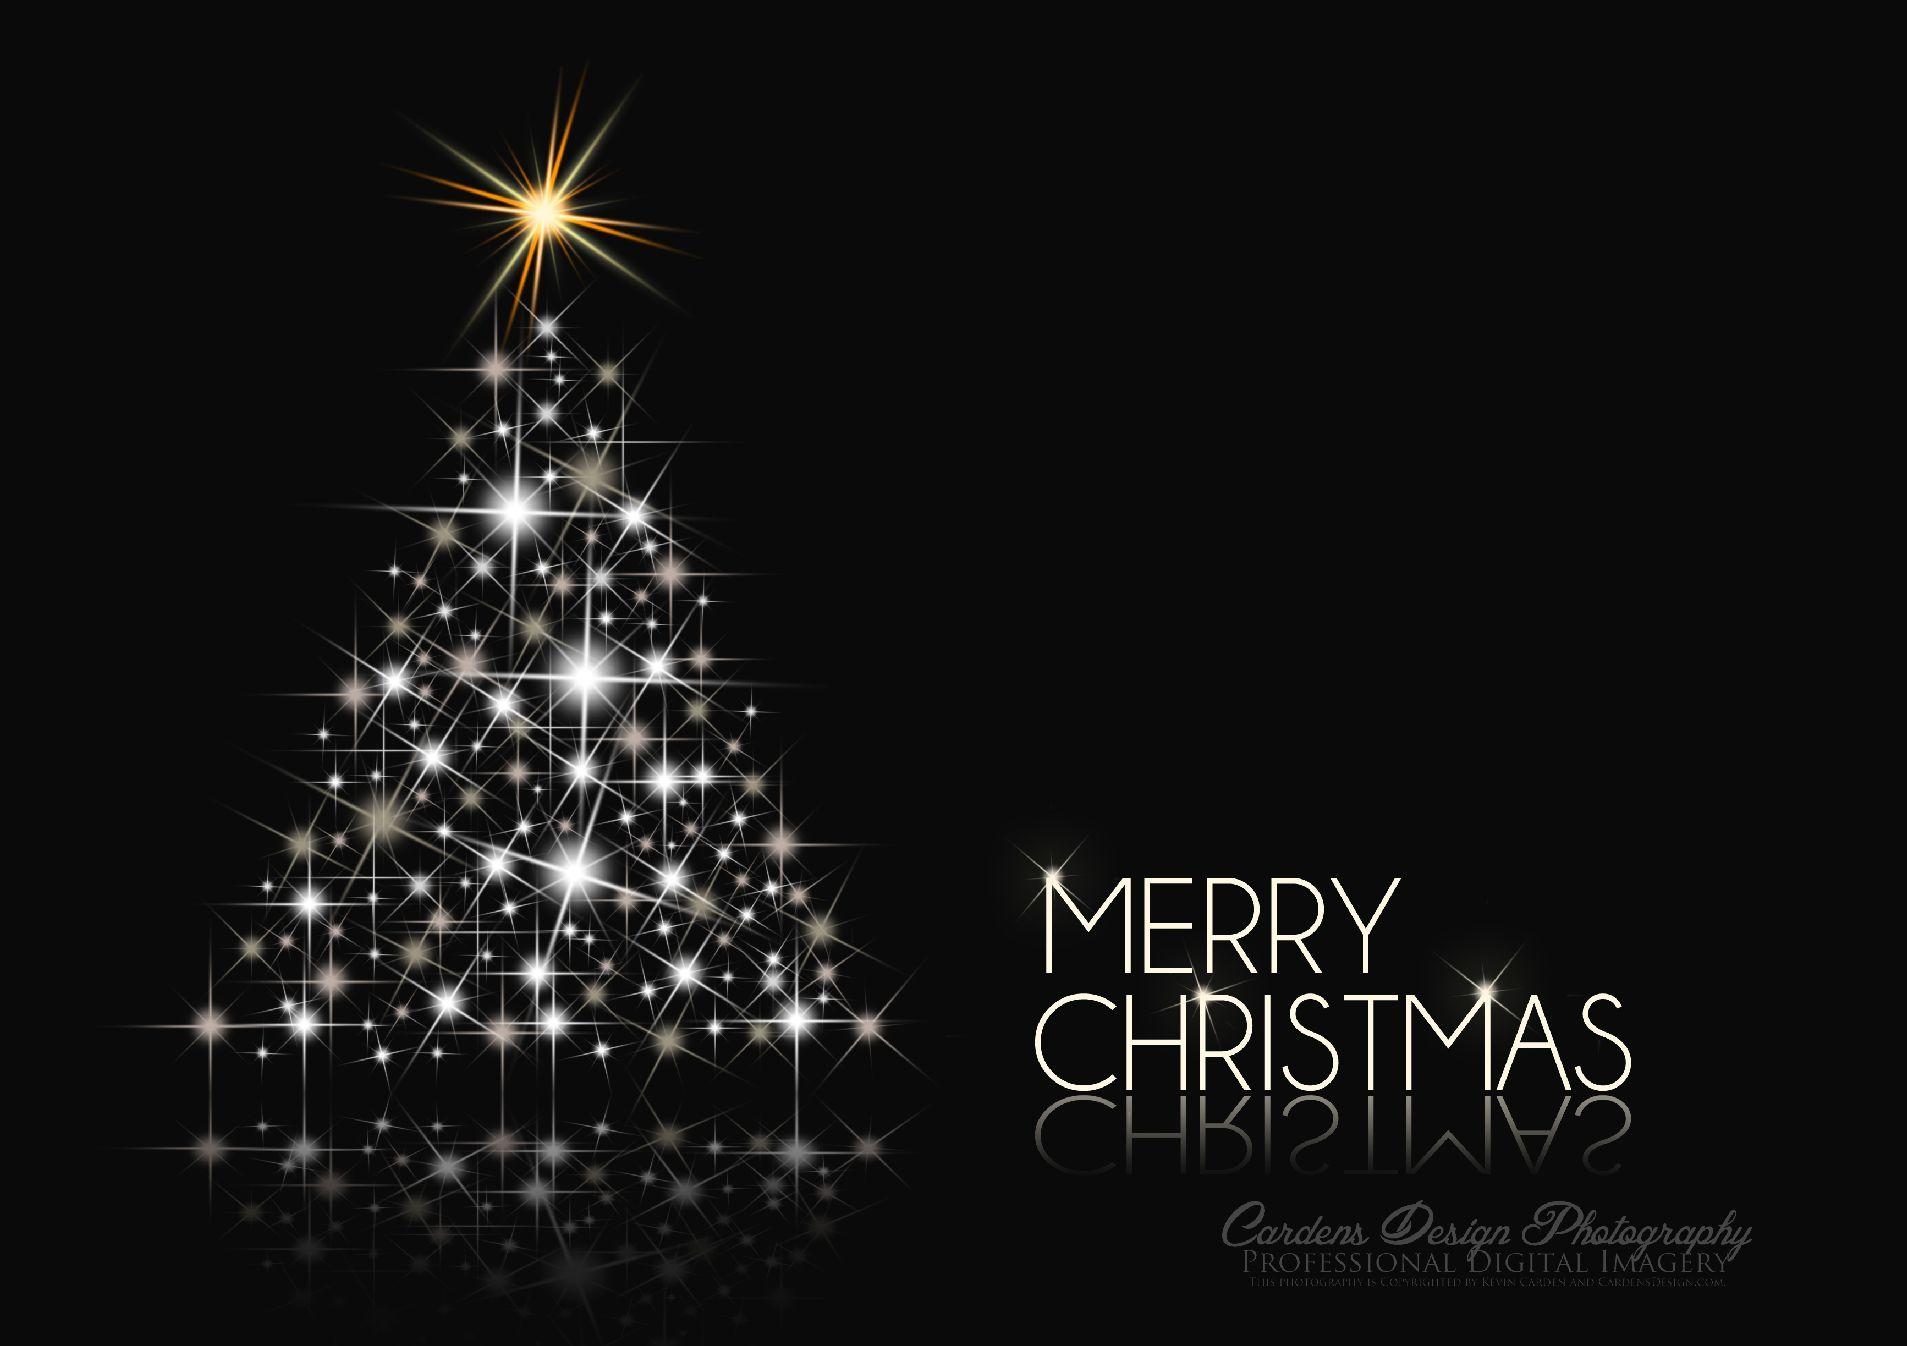 Merry Christmas And Happy Holidays From Dreblacksofresh Description From Dreblackso White Christmas Background Merry Christmas Wallpaper Black Christmas Trees